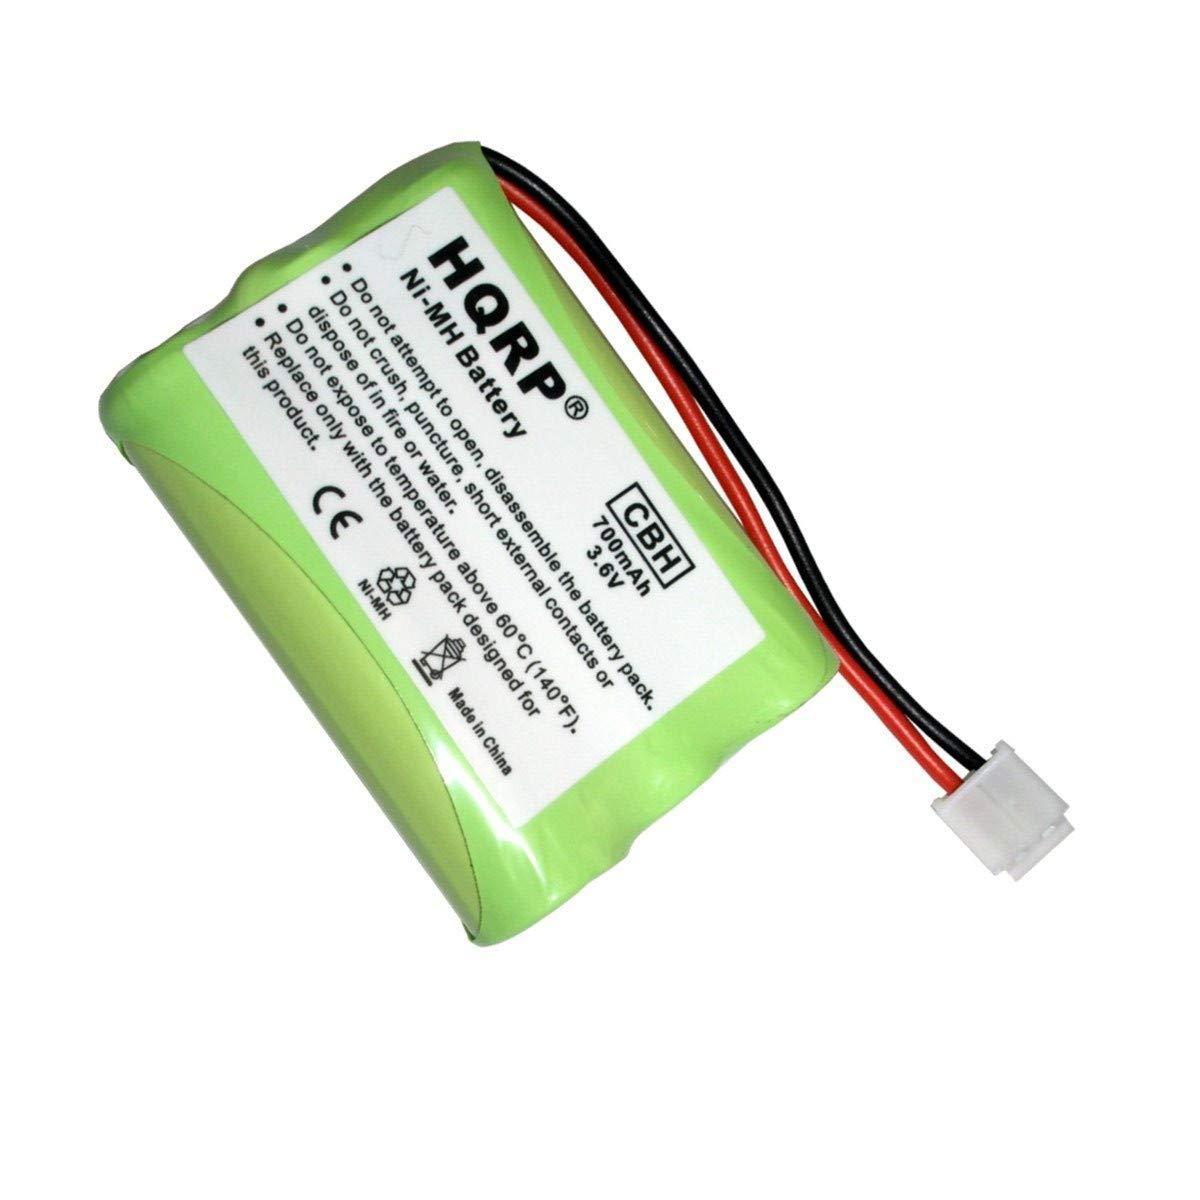 Bateria Para VTech 89-1323-00-00 8913230000 891323 Battery 6